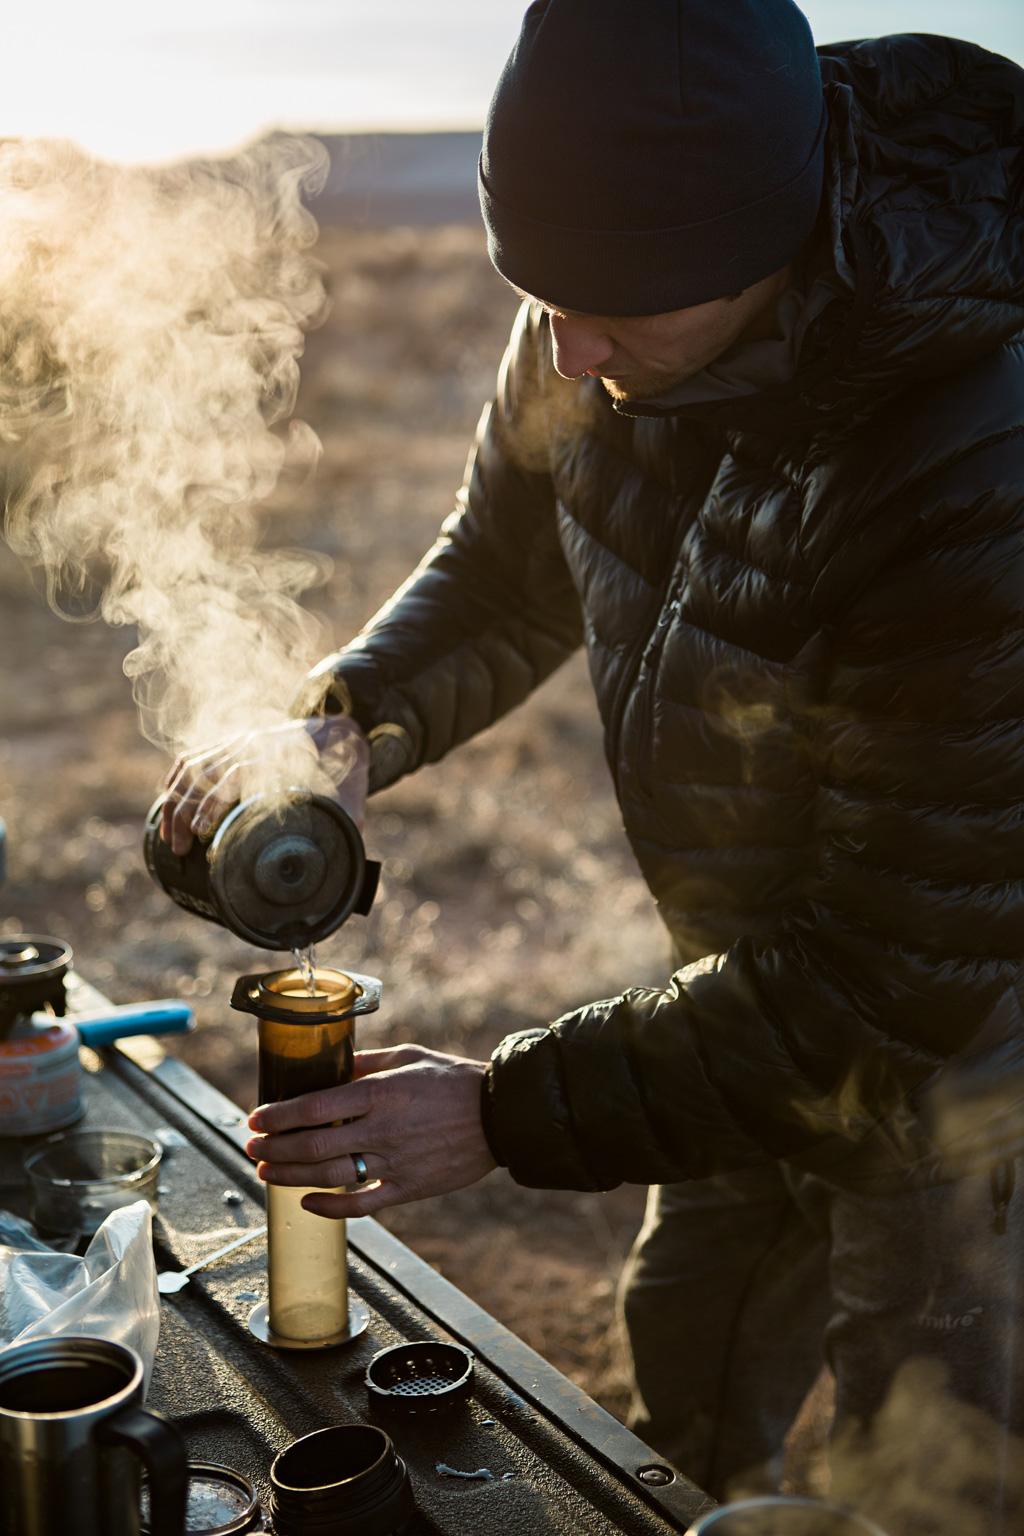 CindyGiovagnoli_Utah_Zion_desert_night_morning_coffee_blm_land_off_grid-010.jpg